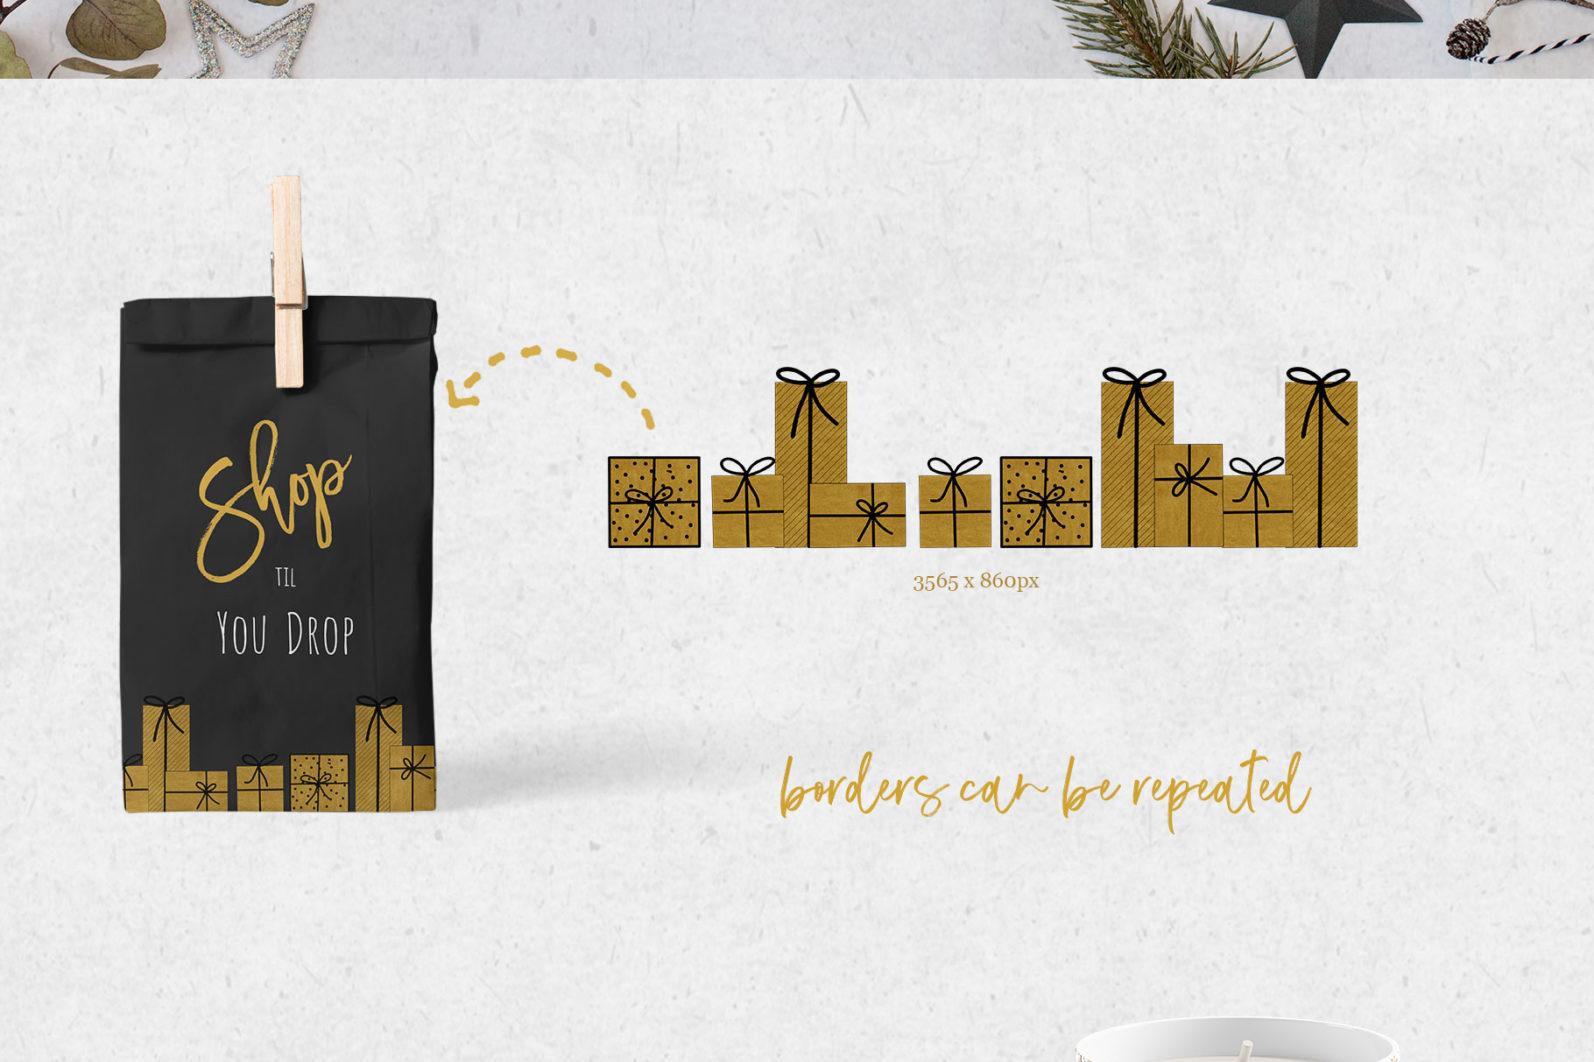 Black & Gold Christmas - chirstmas black gold borders page -